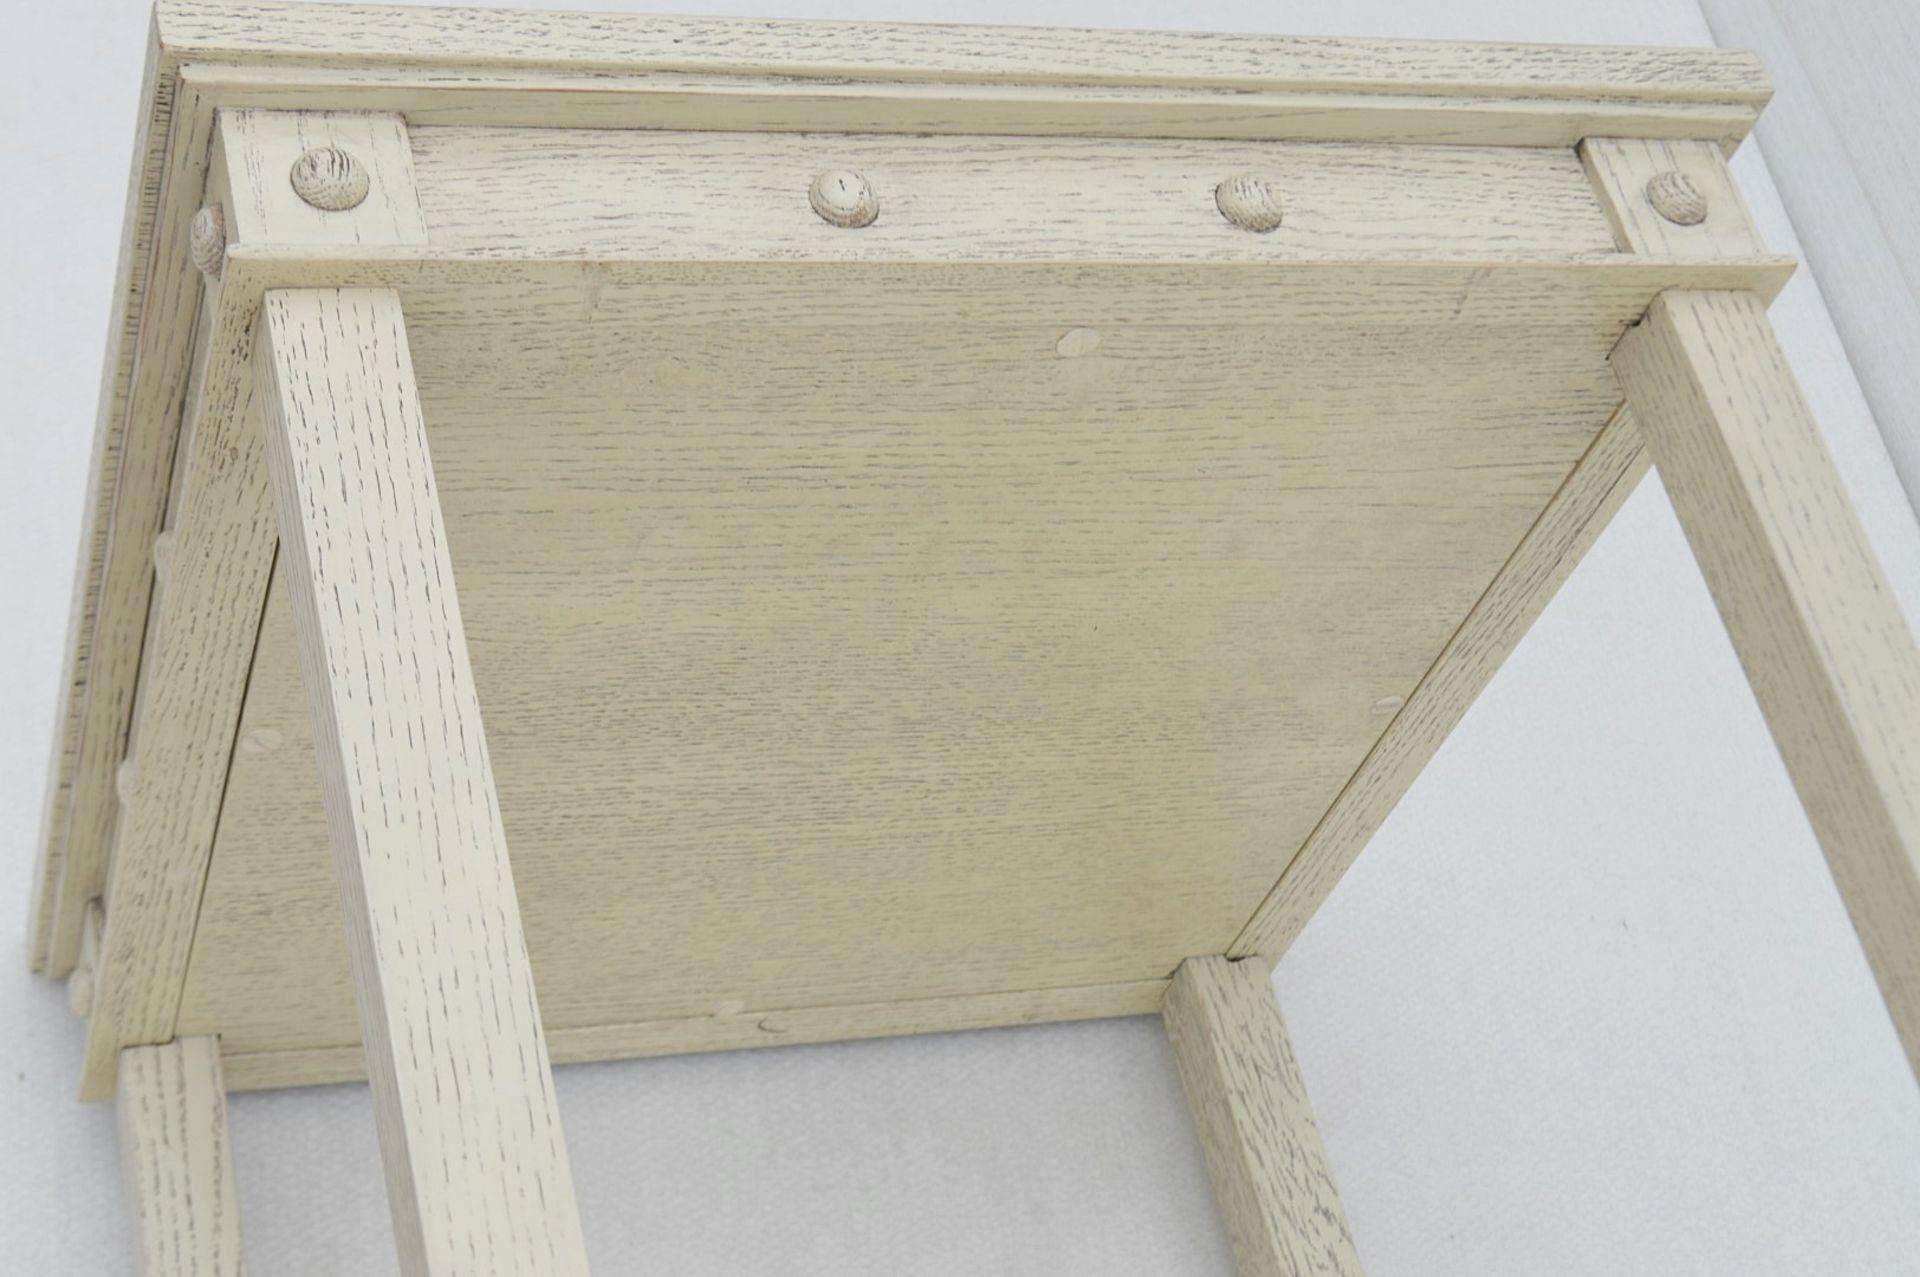 1 x JUSTIN VAN BREDA 'Thomas' Designer Georgian-inspired Table In Limed Grey Oak - RRP £1,320 - Image 5 of 6